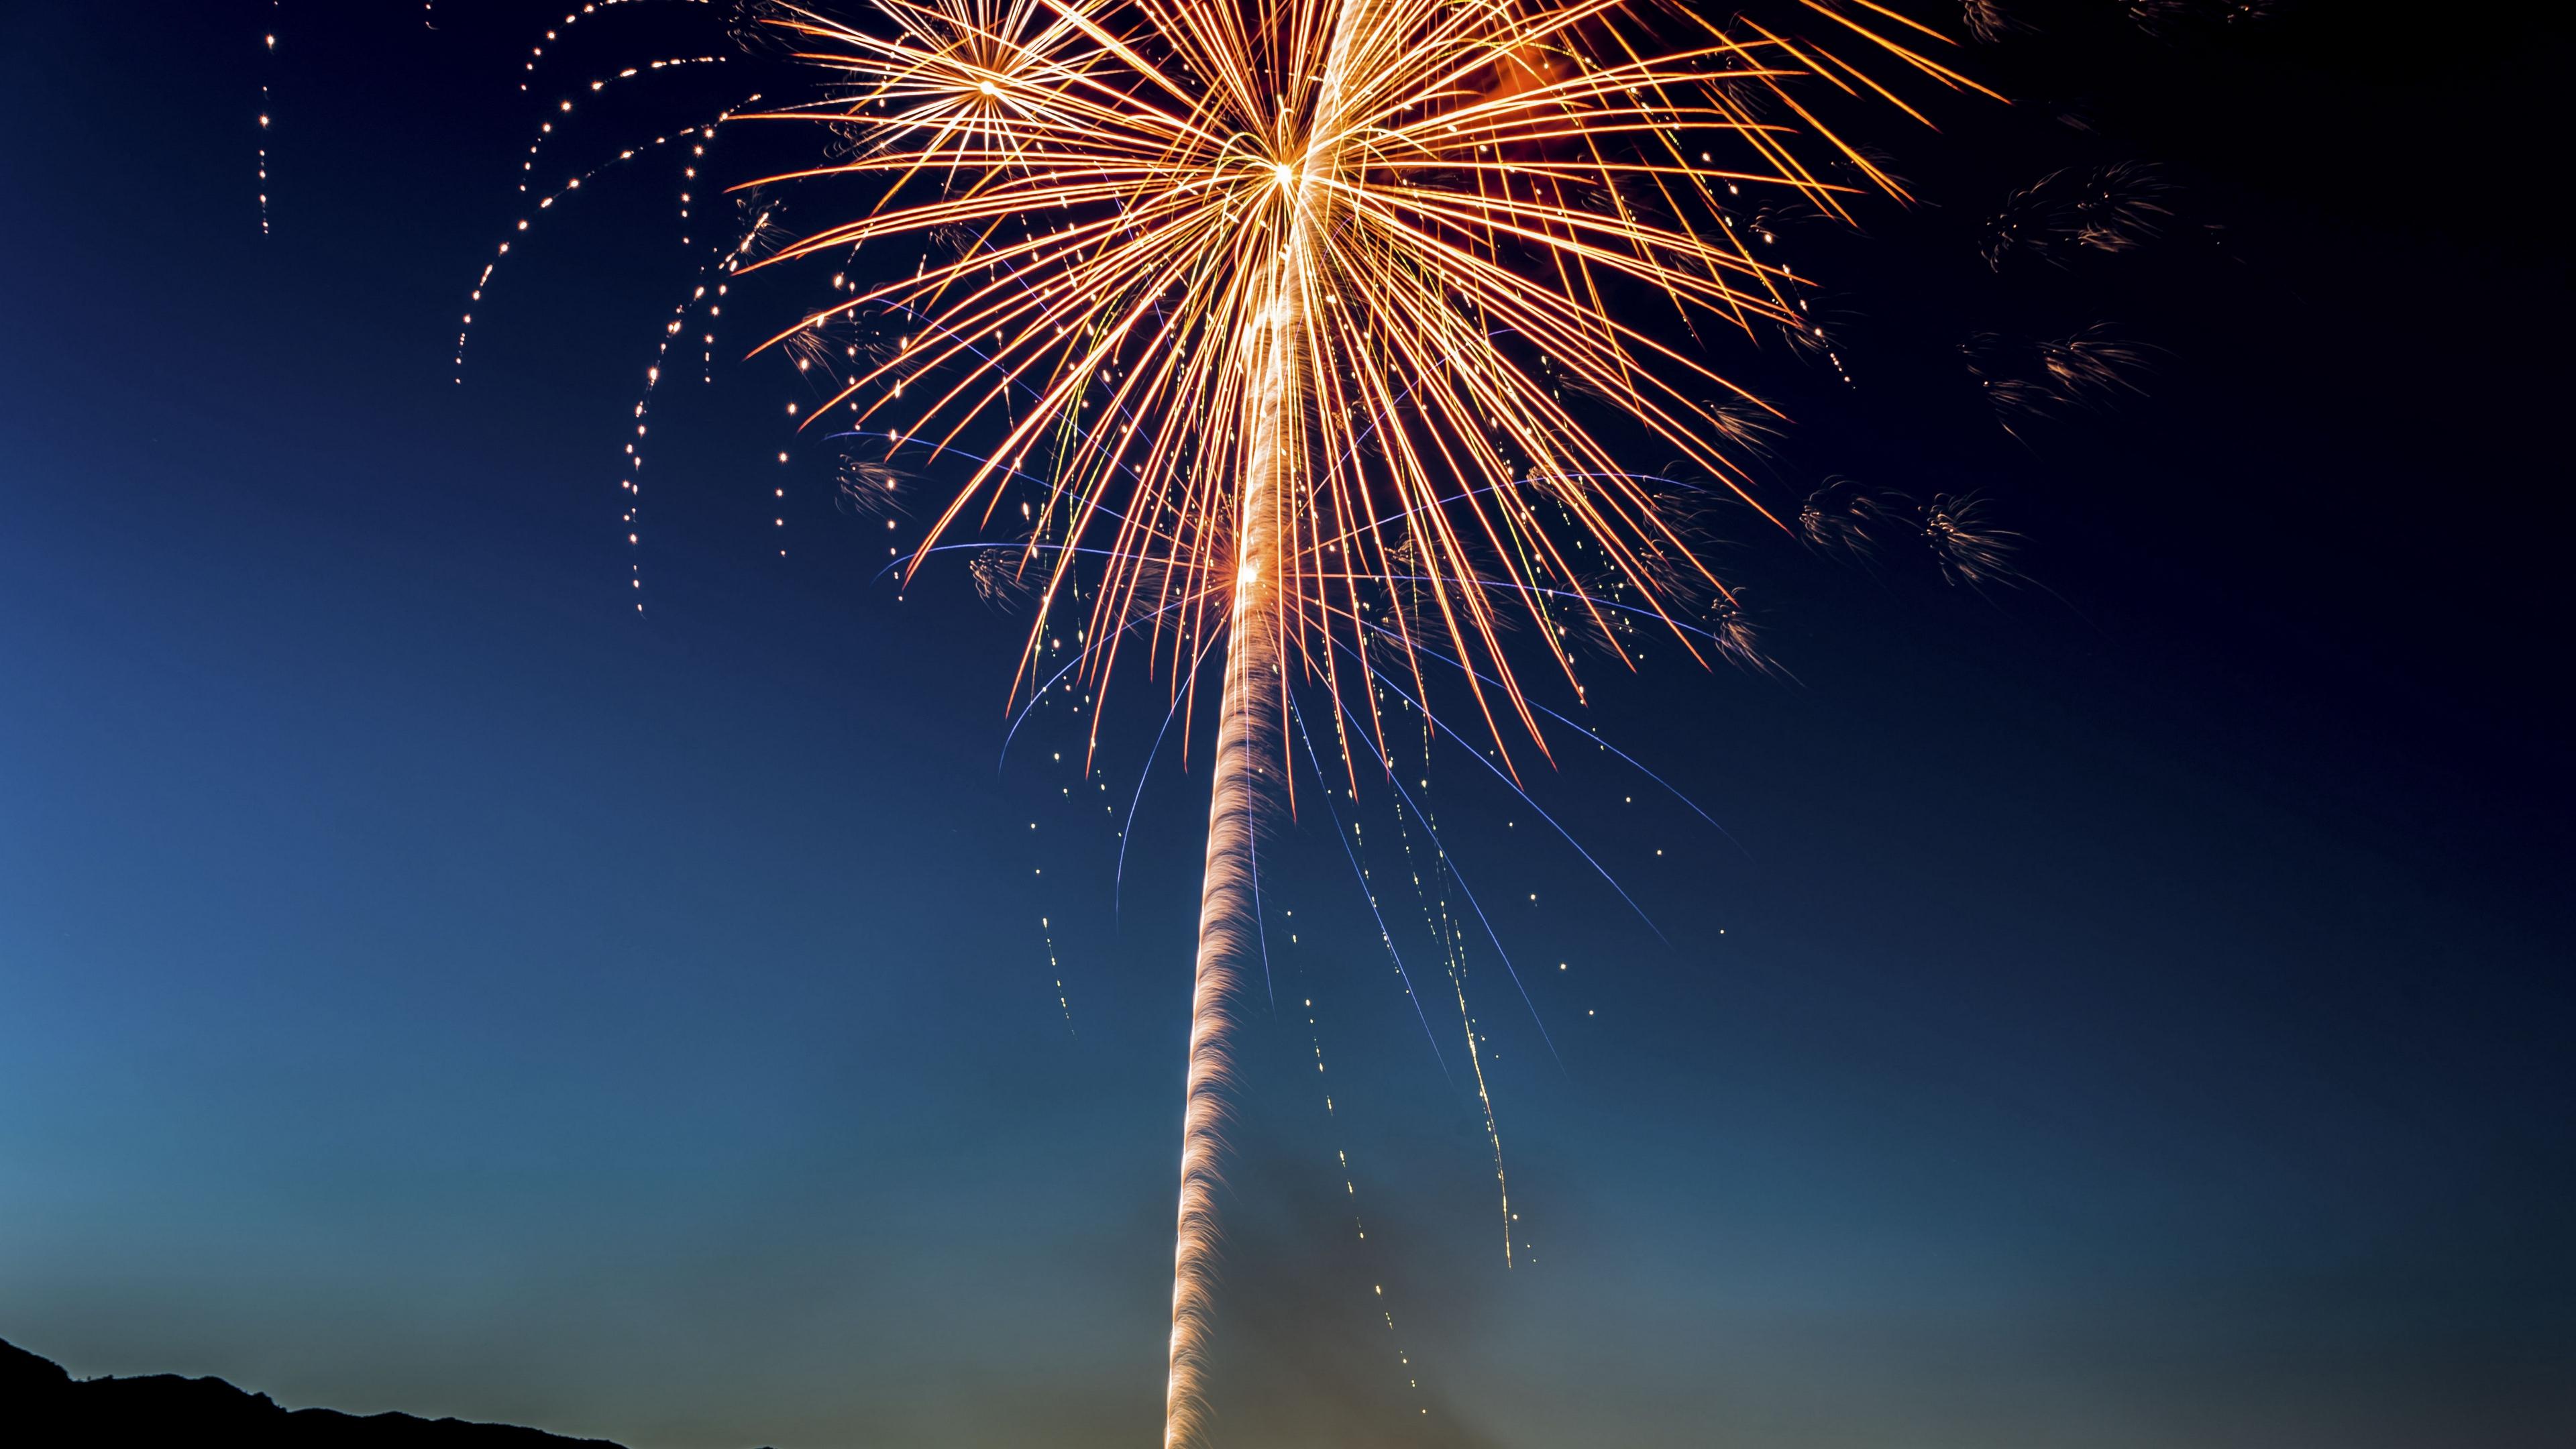 salute fireworks holiday 4k 1538344574 - salute, fireworks, holiday 4k - salute, Holiday, Fireworks